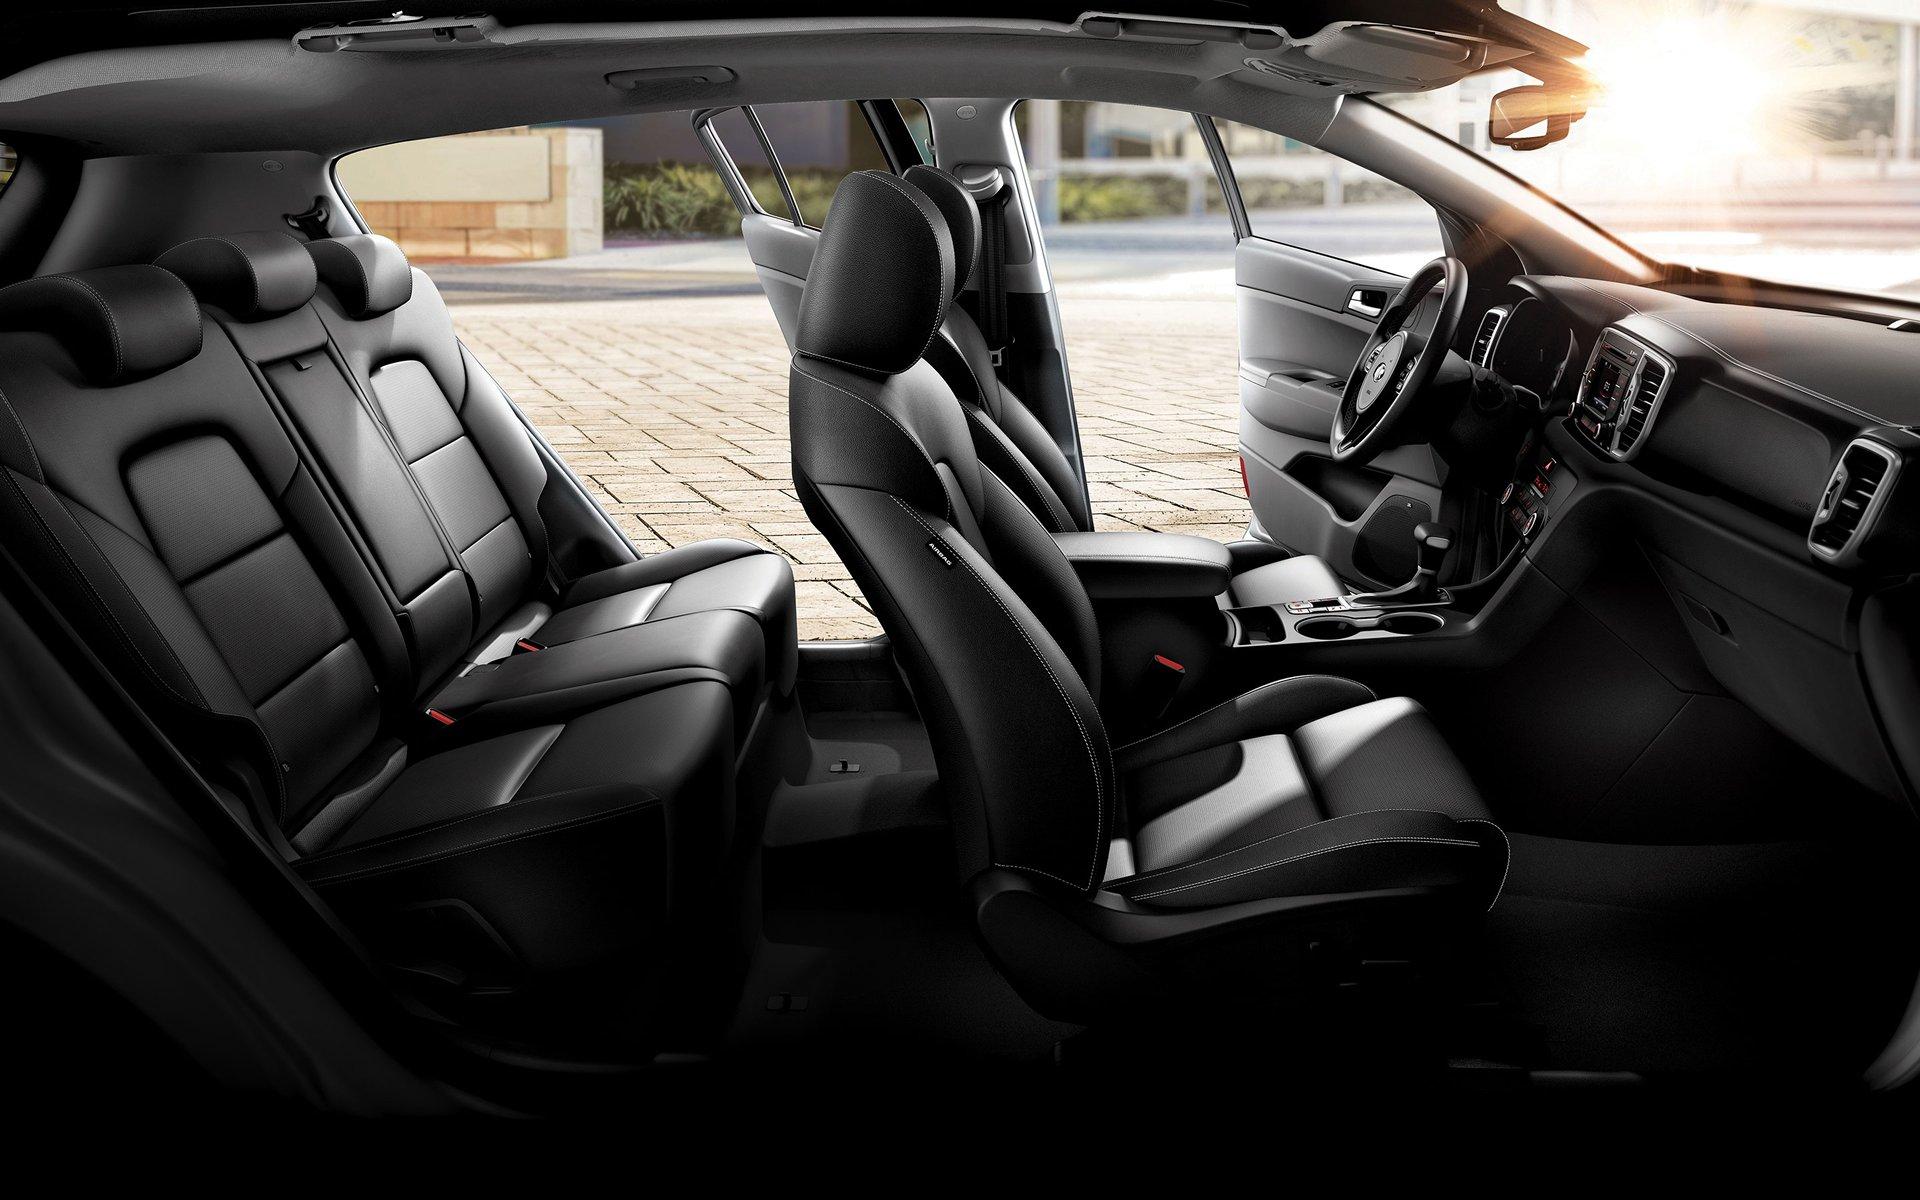 New Kia Sportage Interior main image